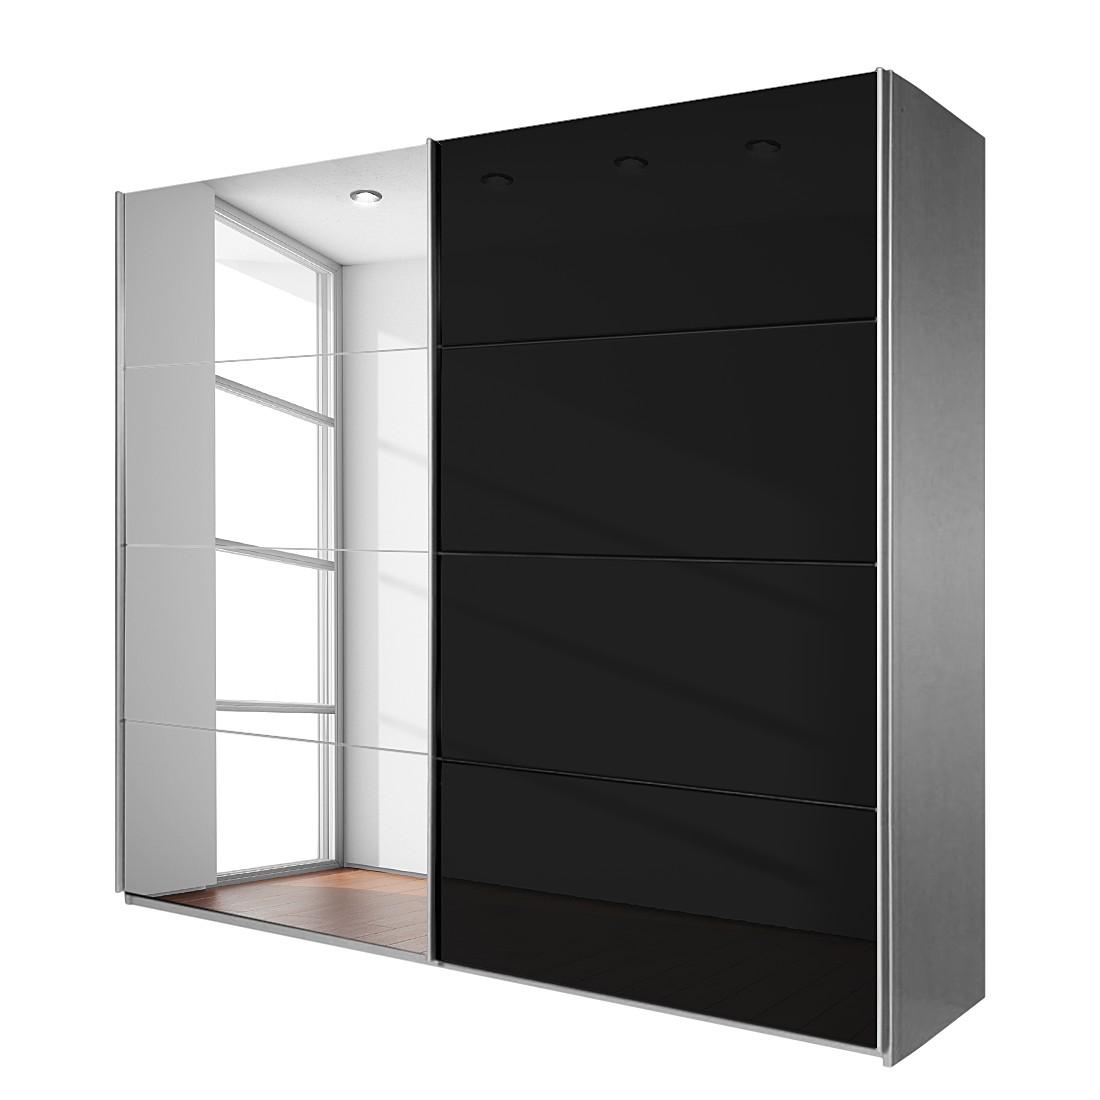 goedkoop Schuifdeurkast Quadra met spiegel geborsteld aluminium zwart kastbreedte 136cm 2 deurs Rauch Packs